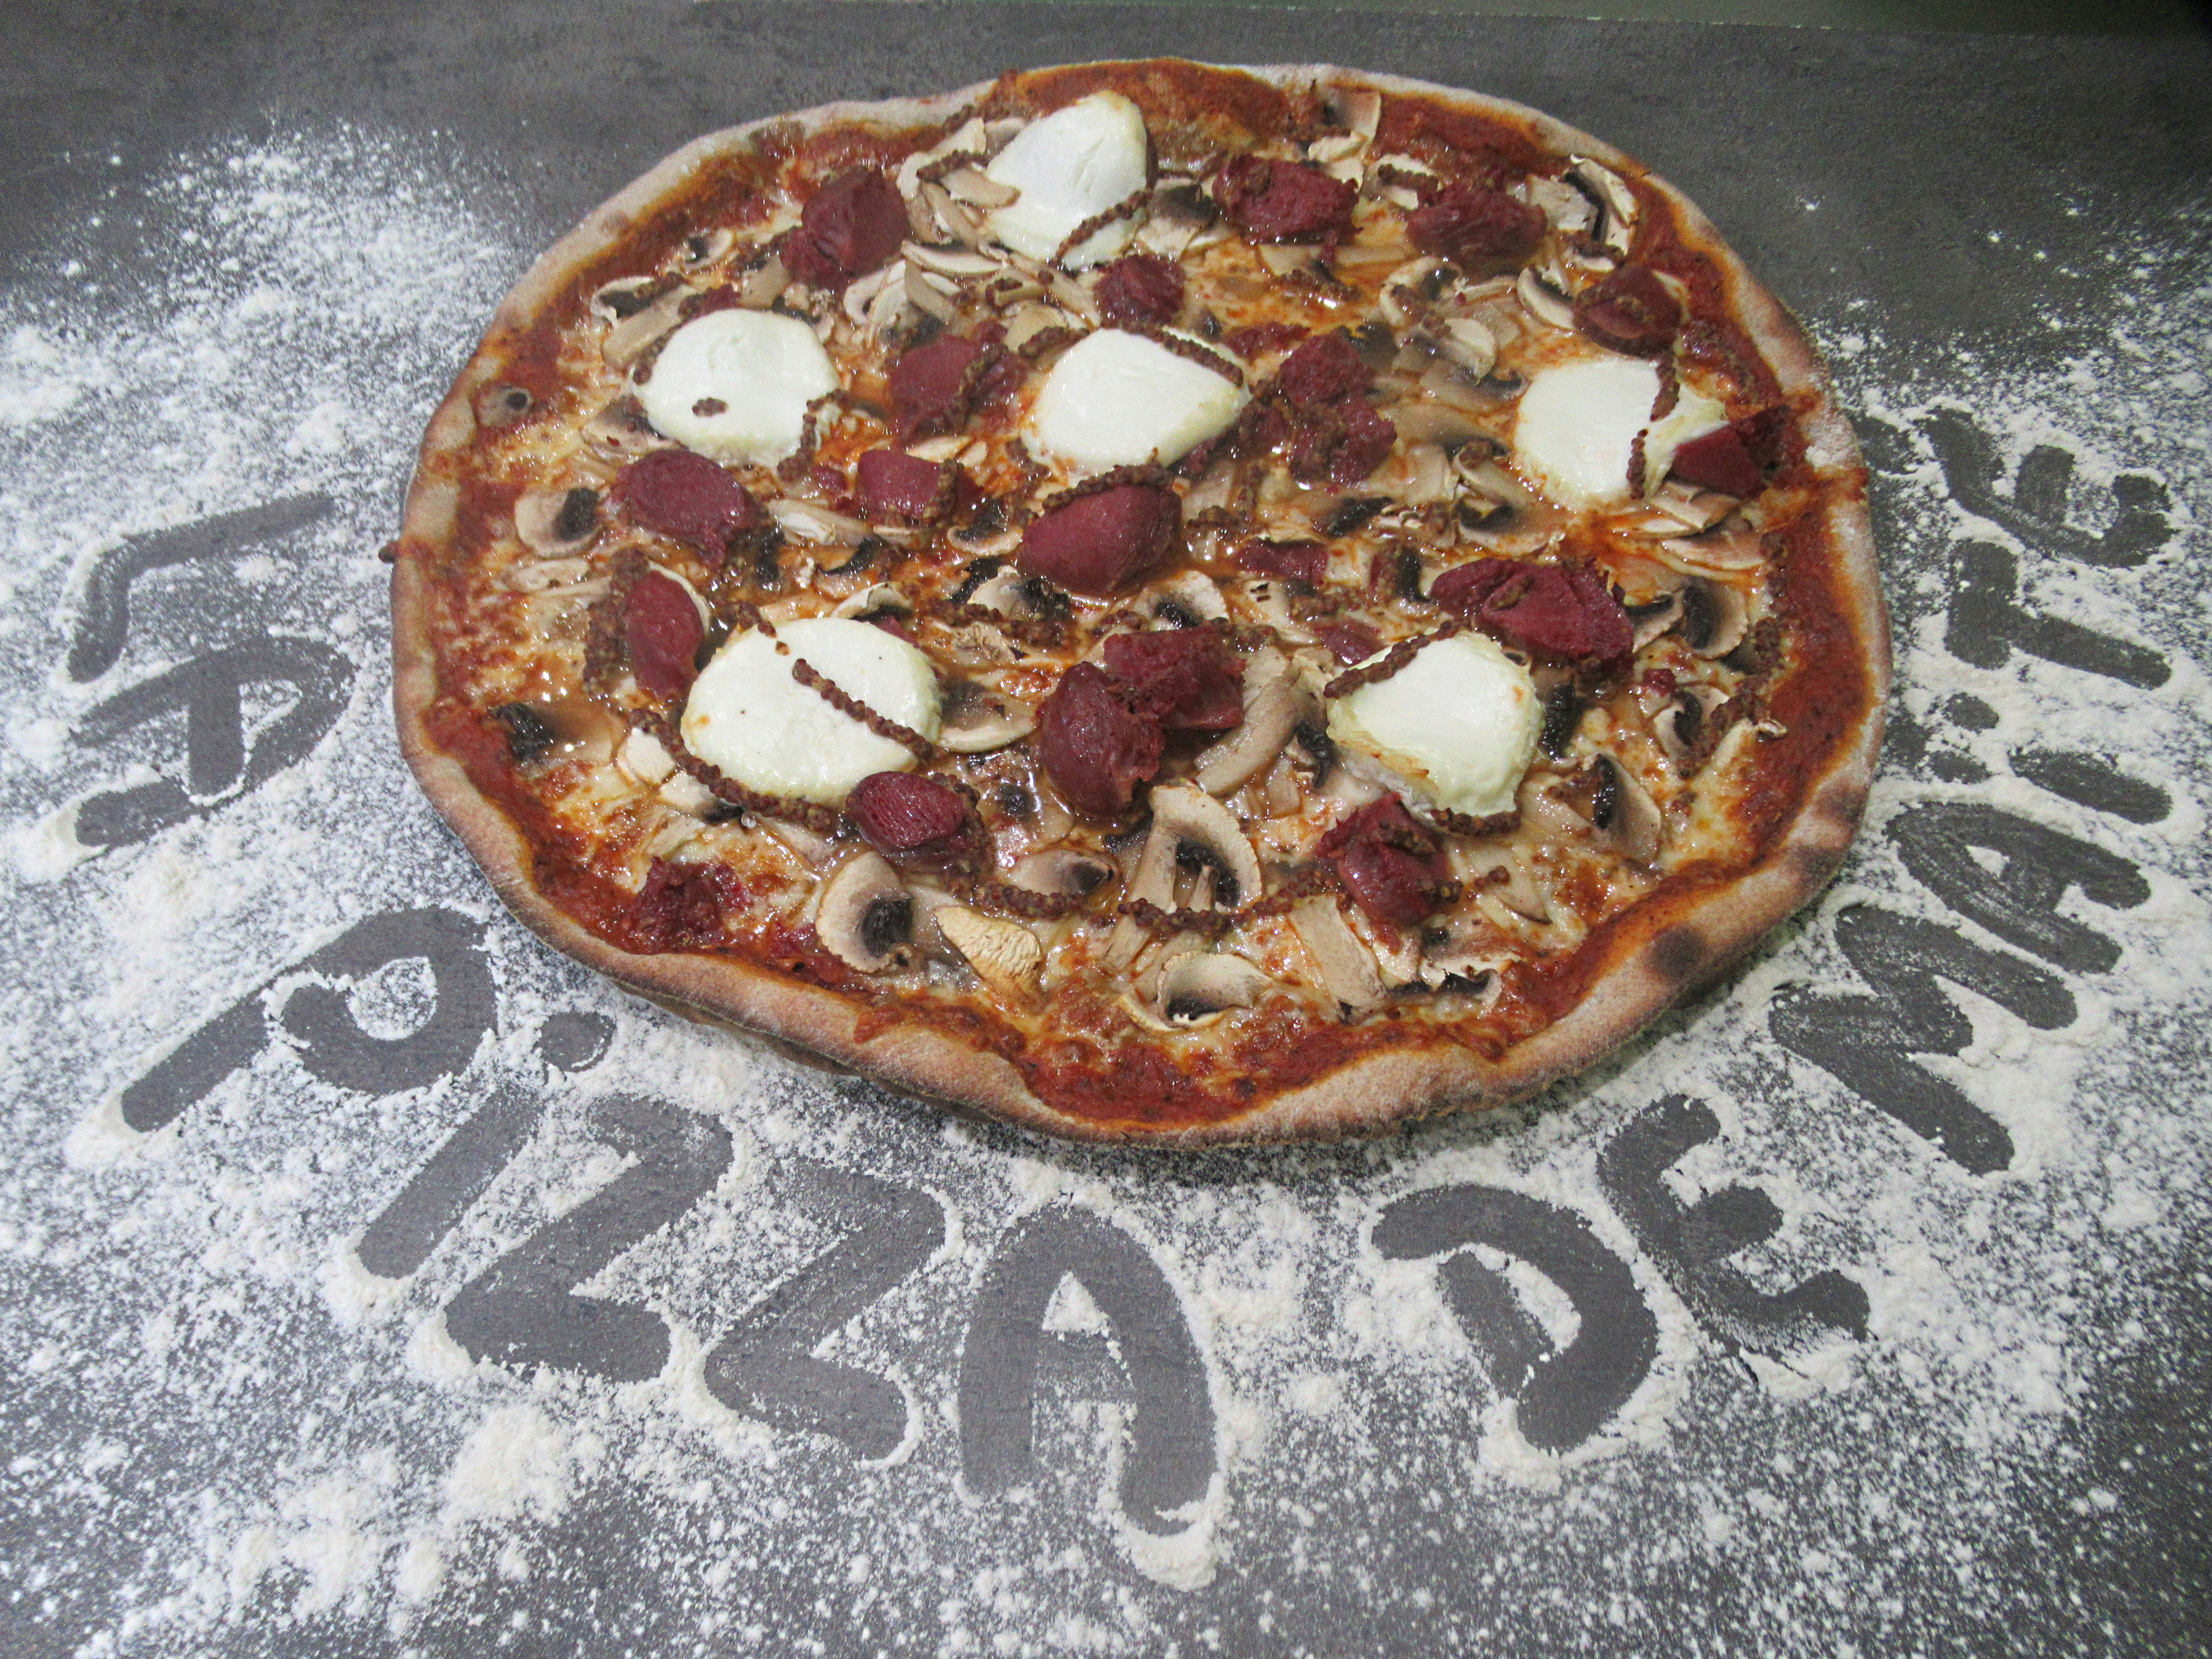 La pizza du moment